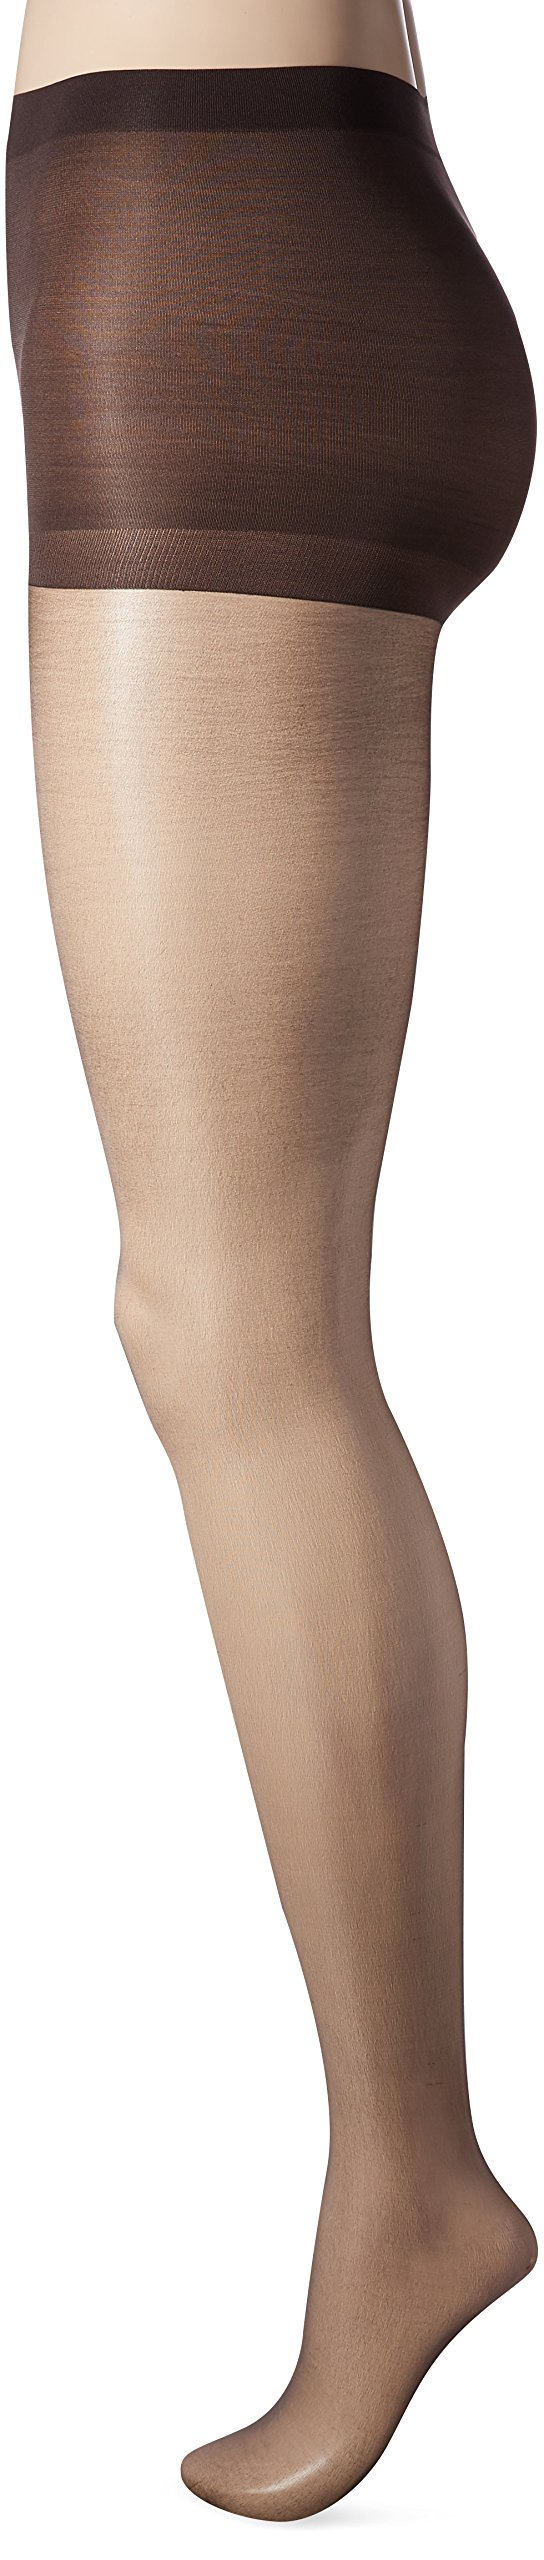 L'eggs Women's Silken Mist Control Top Sheer Toe Run Resist Ultra Sheer Leg Panty Hose, Black Mist, Q+